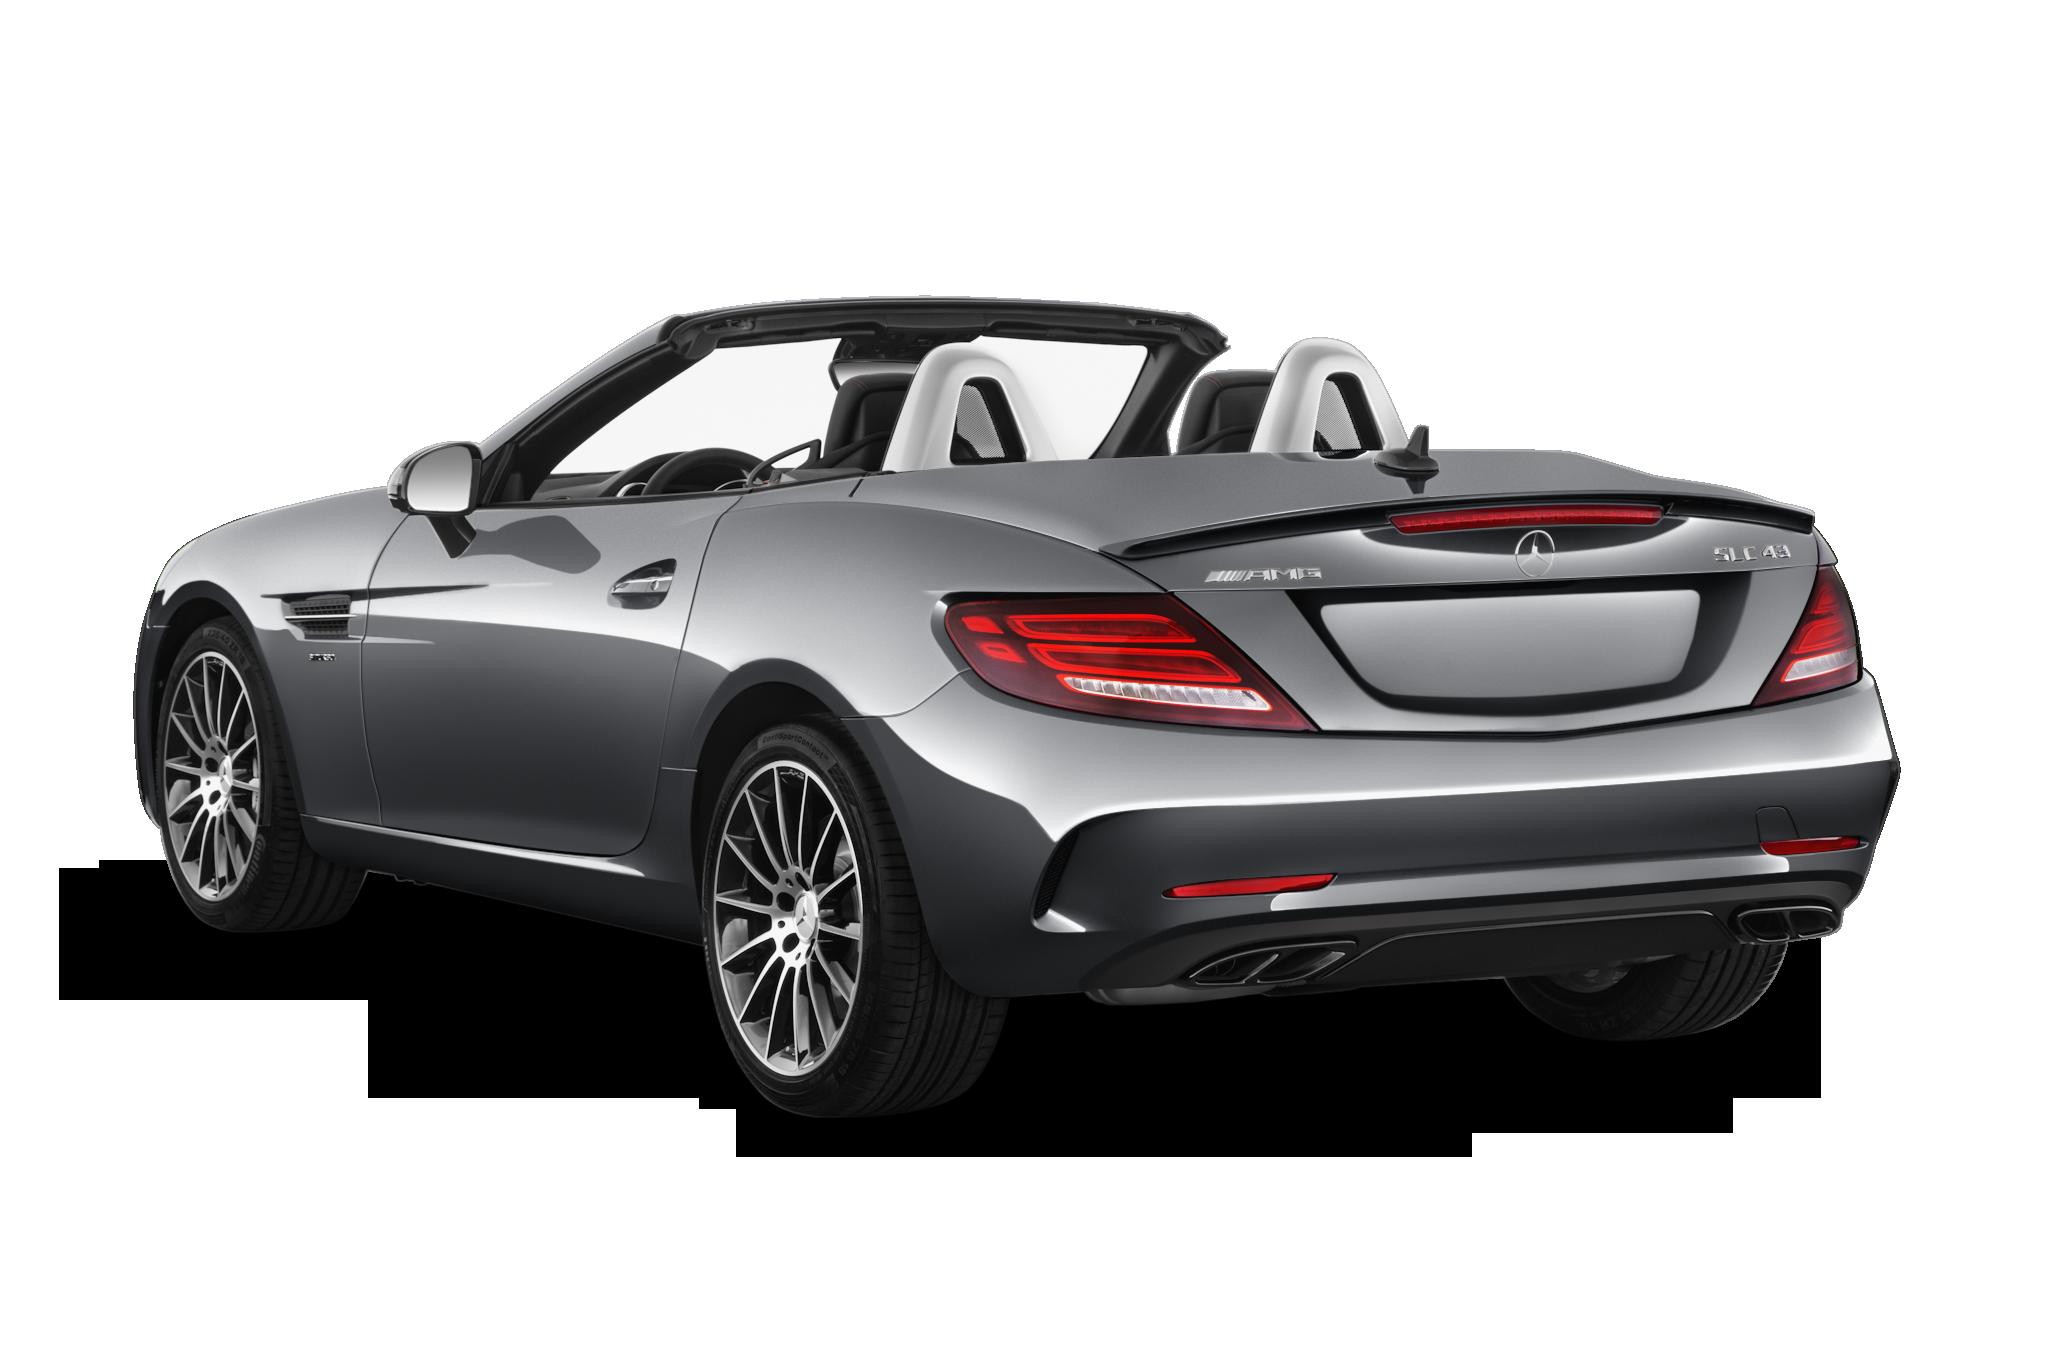 2017 Mercedes Benz Slc Class Review